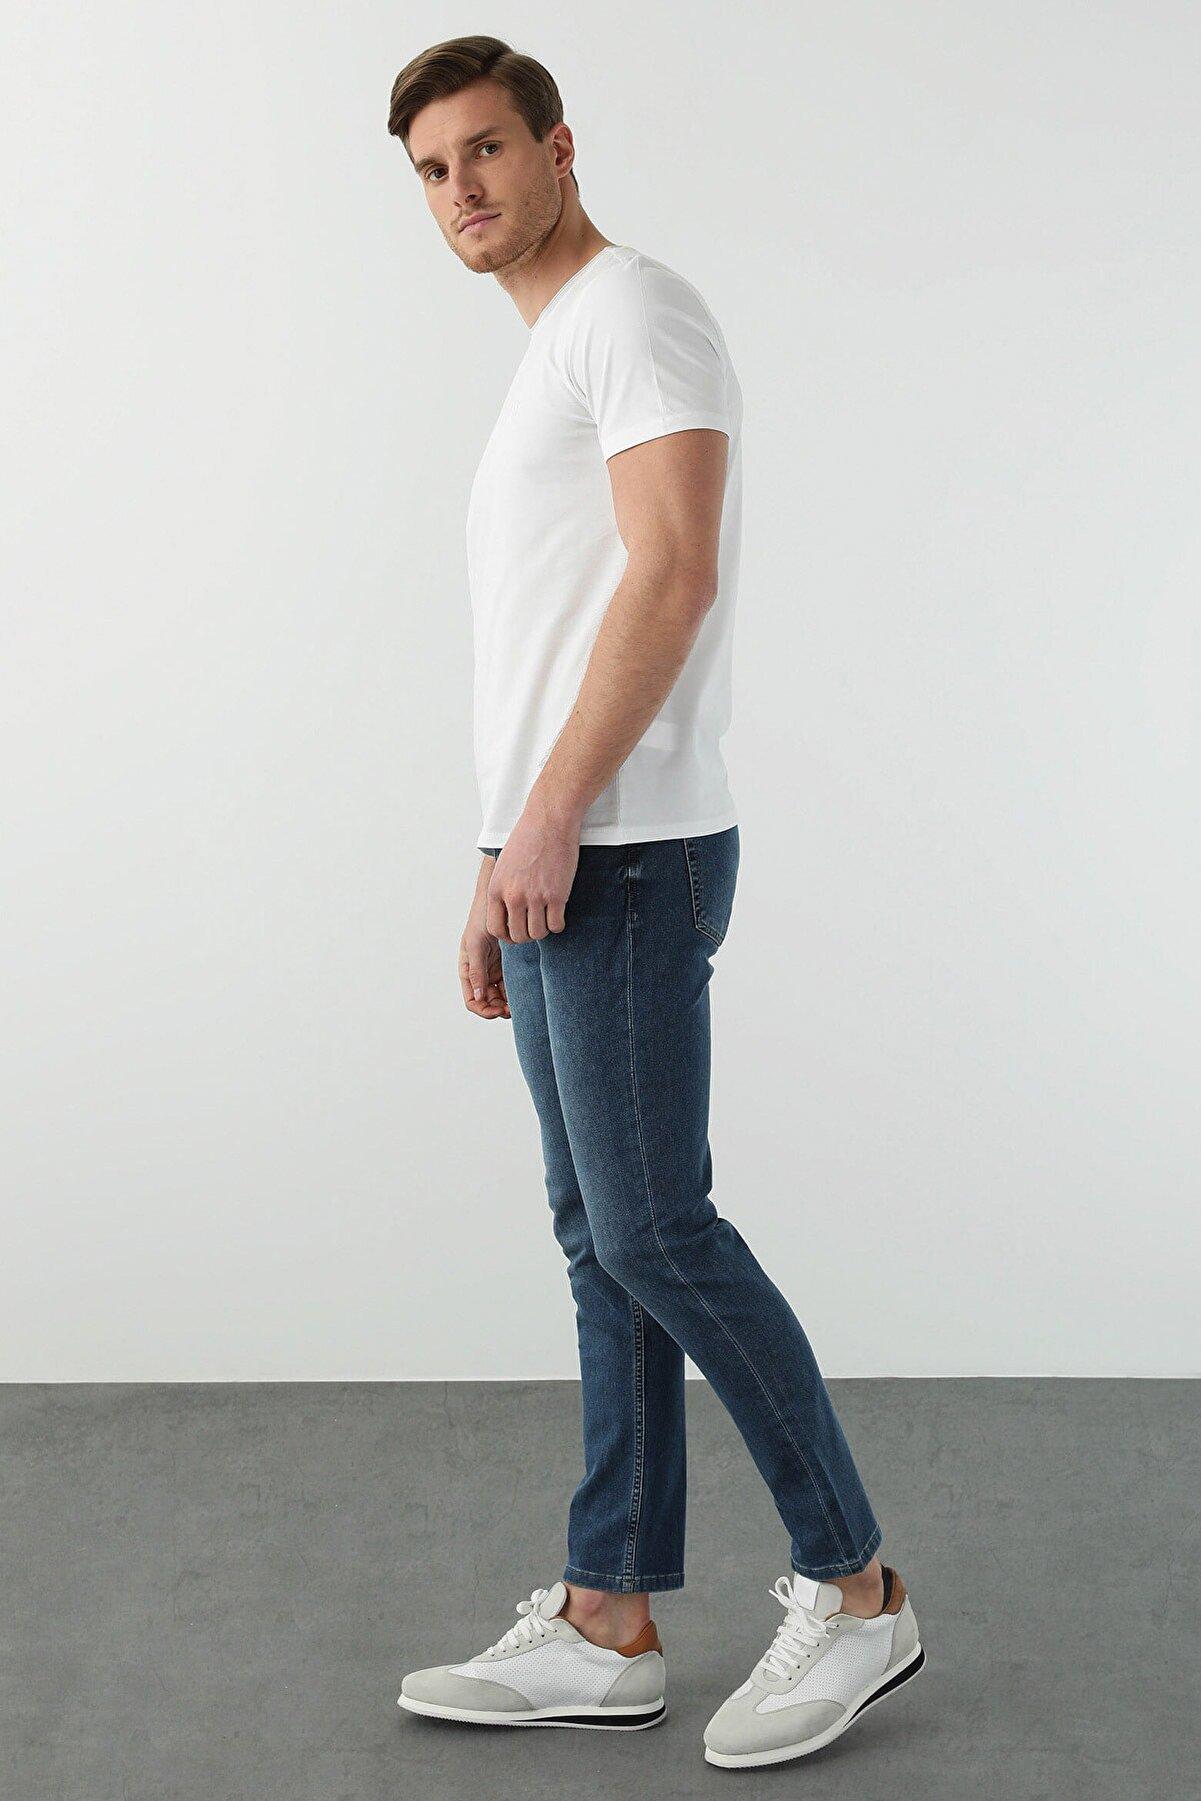 Network Erkek Slim Fit Beyaz T-shirt 1077937